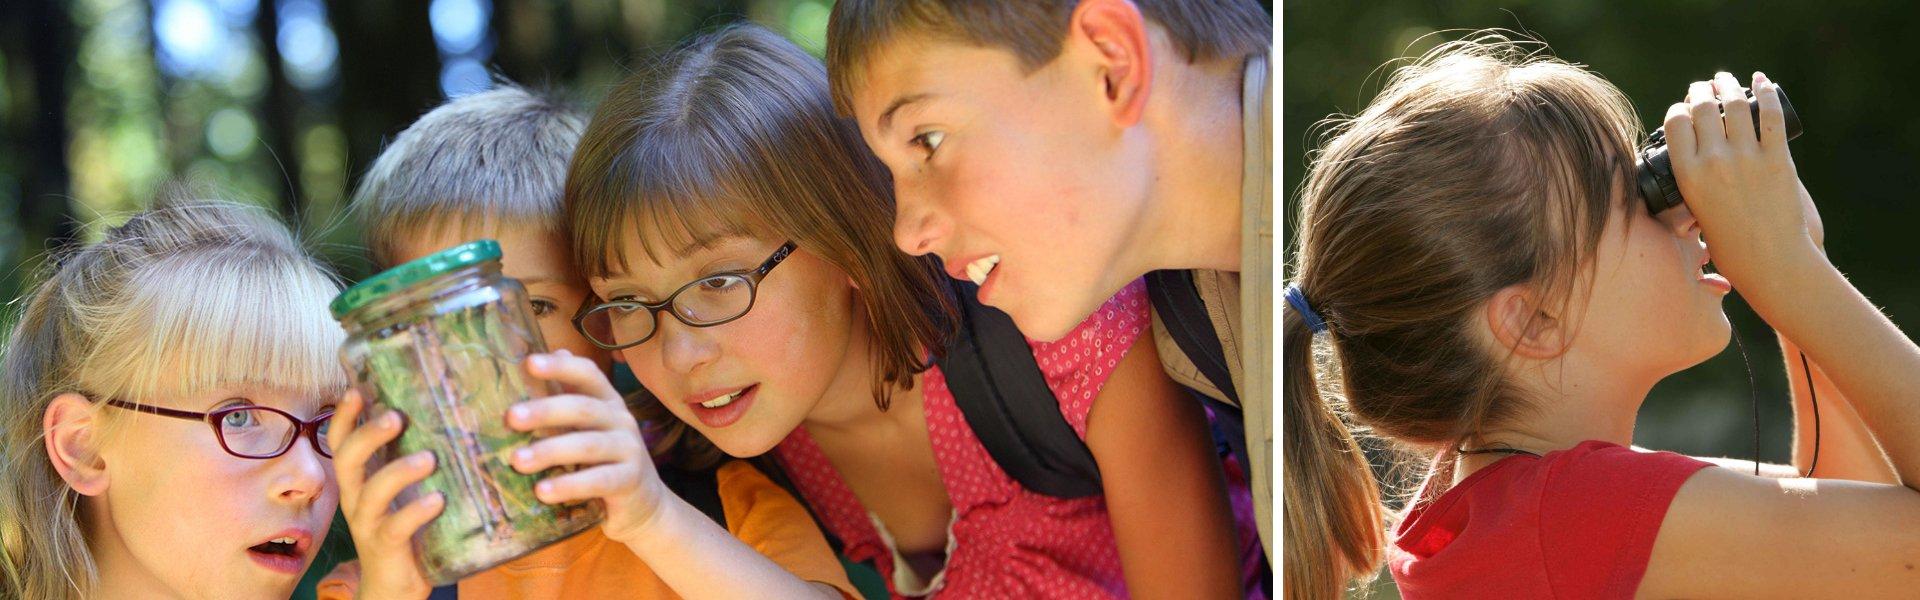 school-program-preserve-grades-4-5-footer